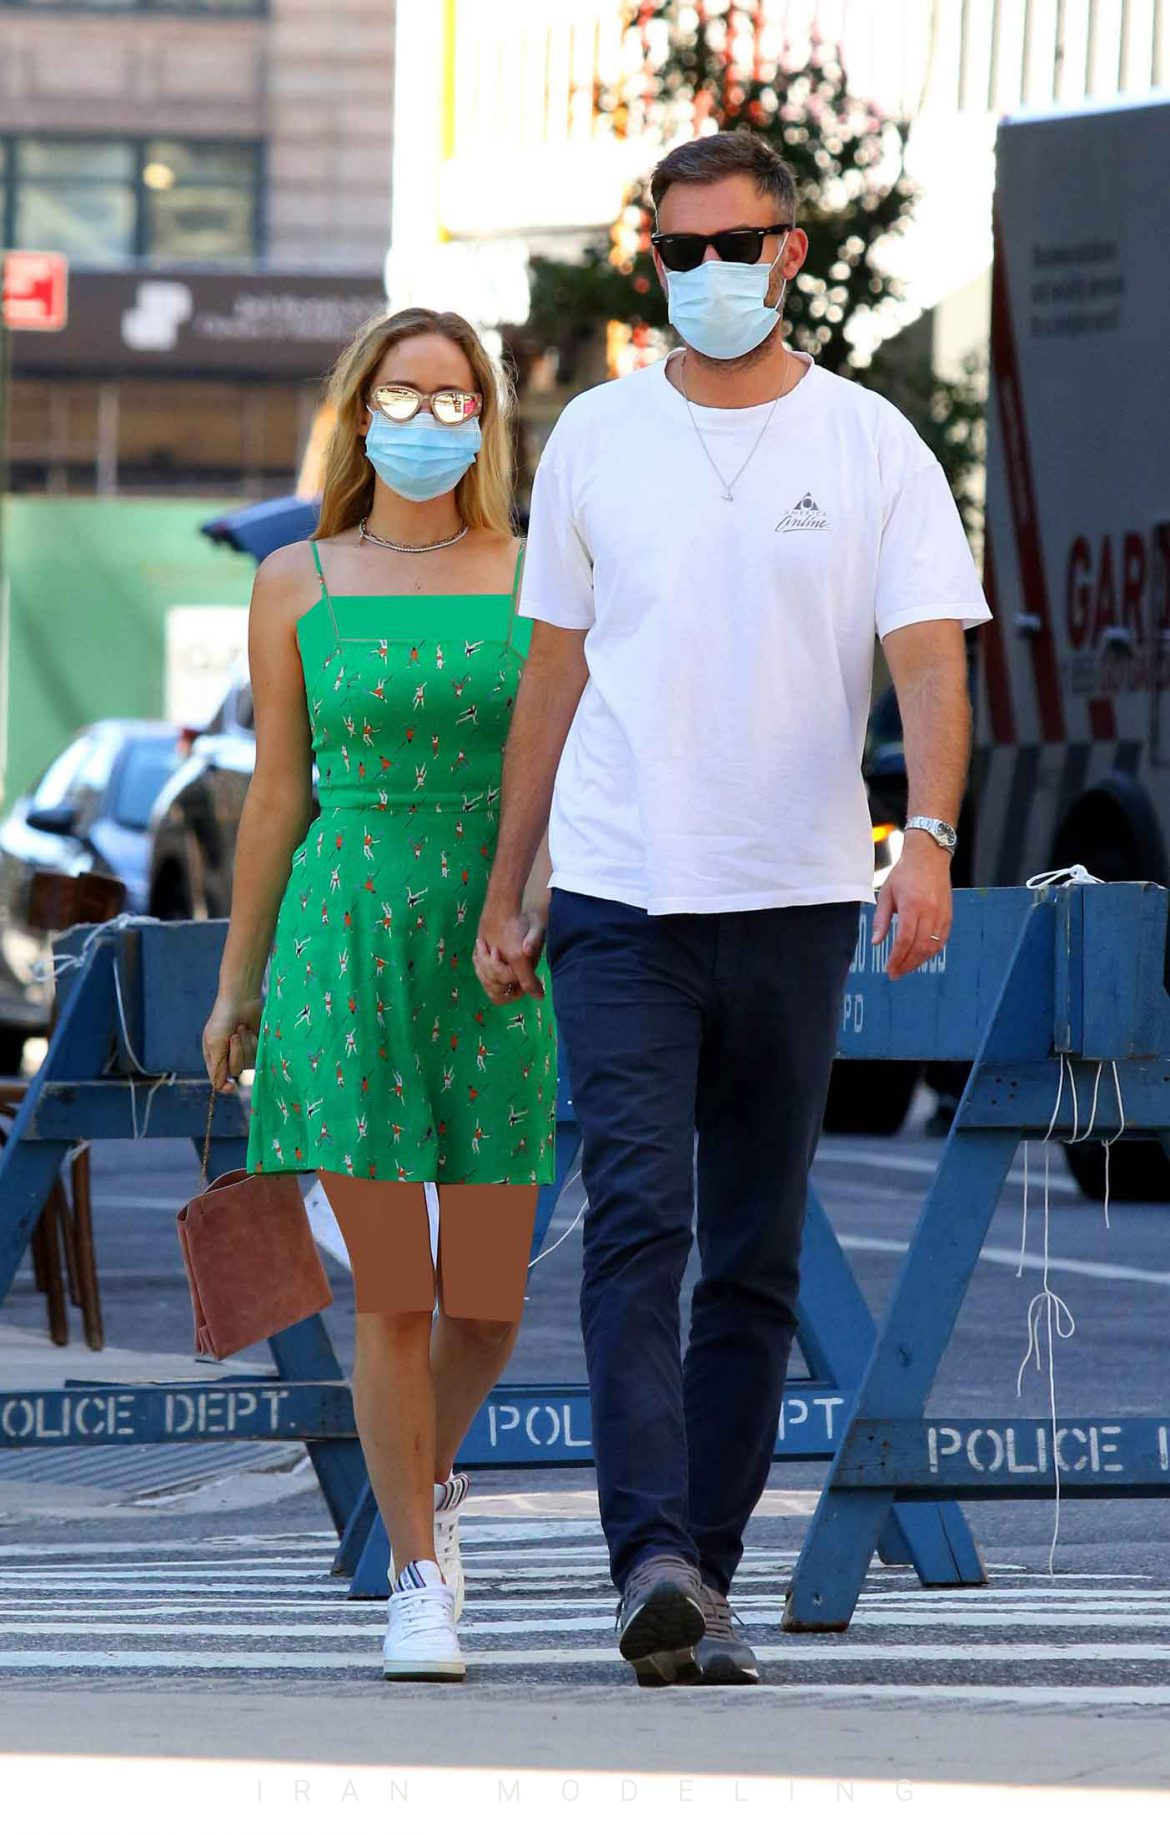 سبک لباس جنیفر لارنس و همسرش کوک مارونی در آخر هفته نیویورک